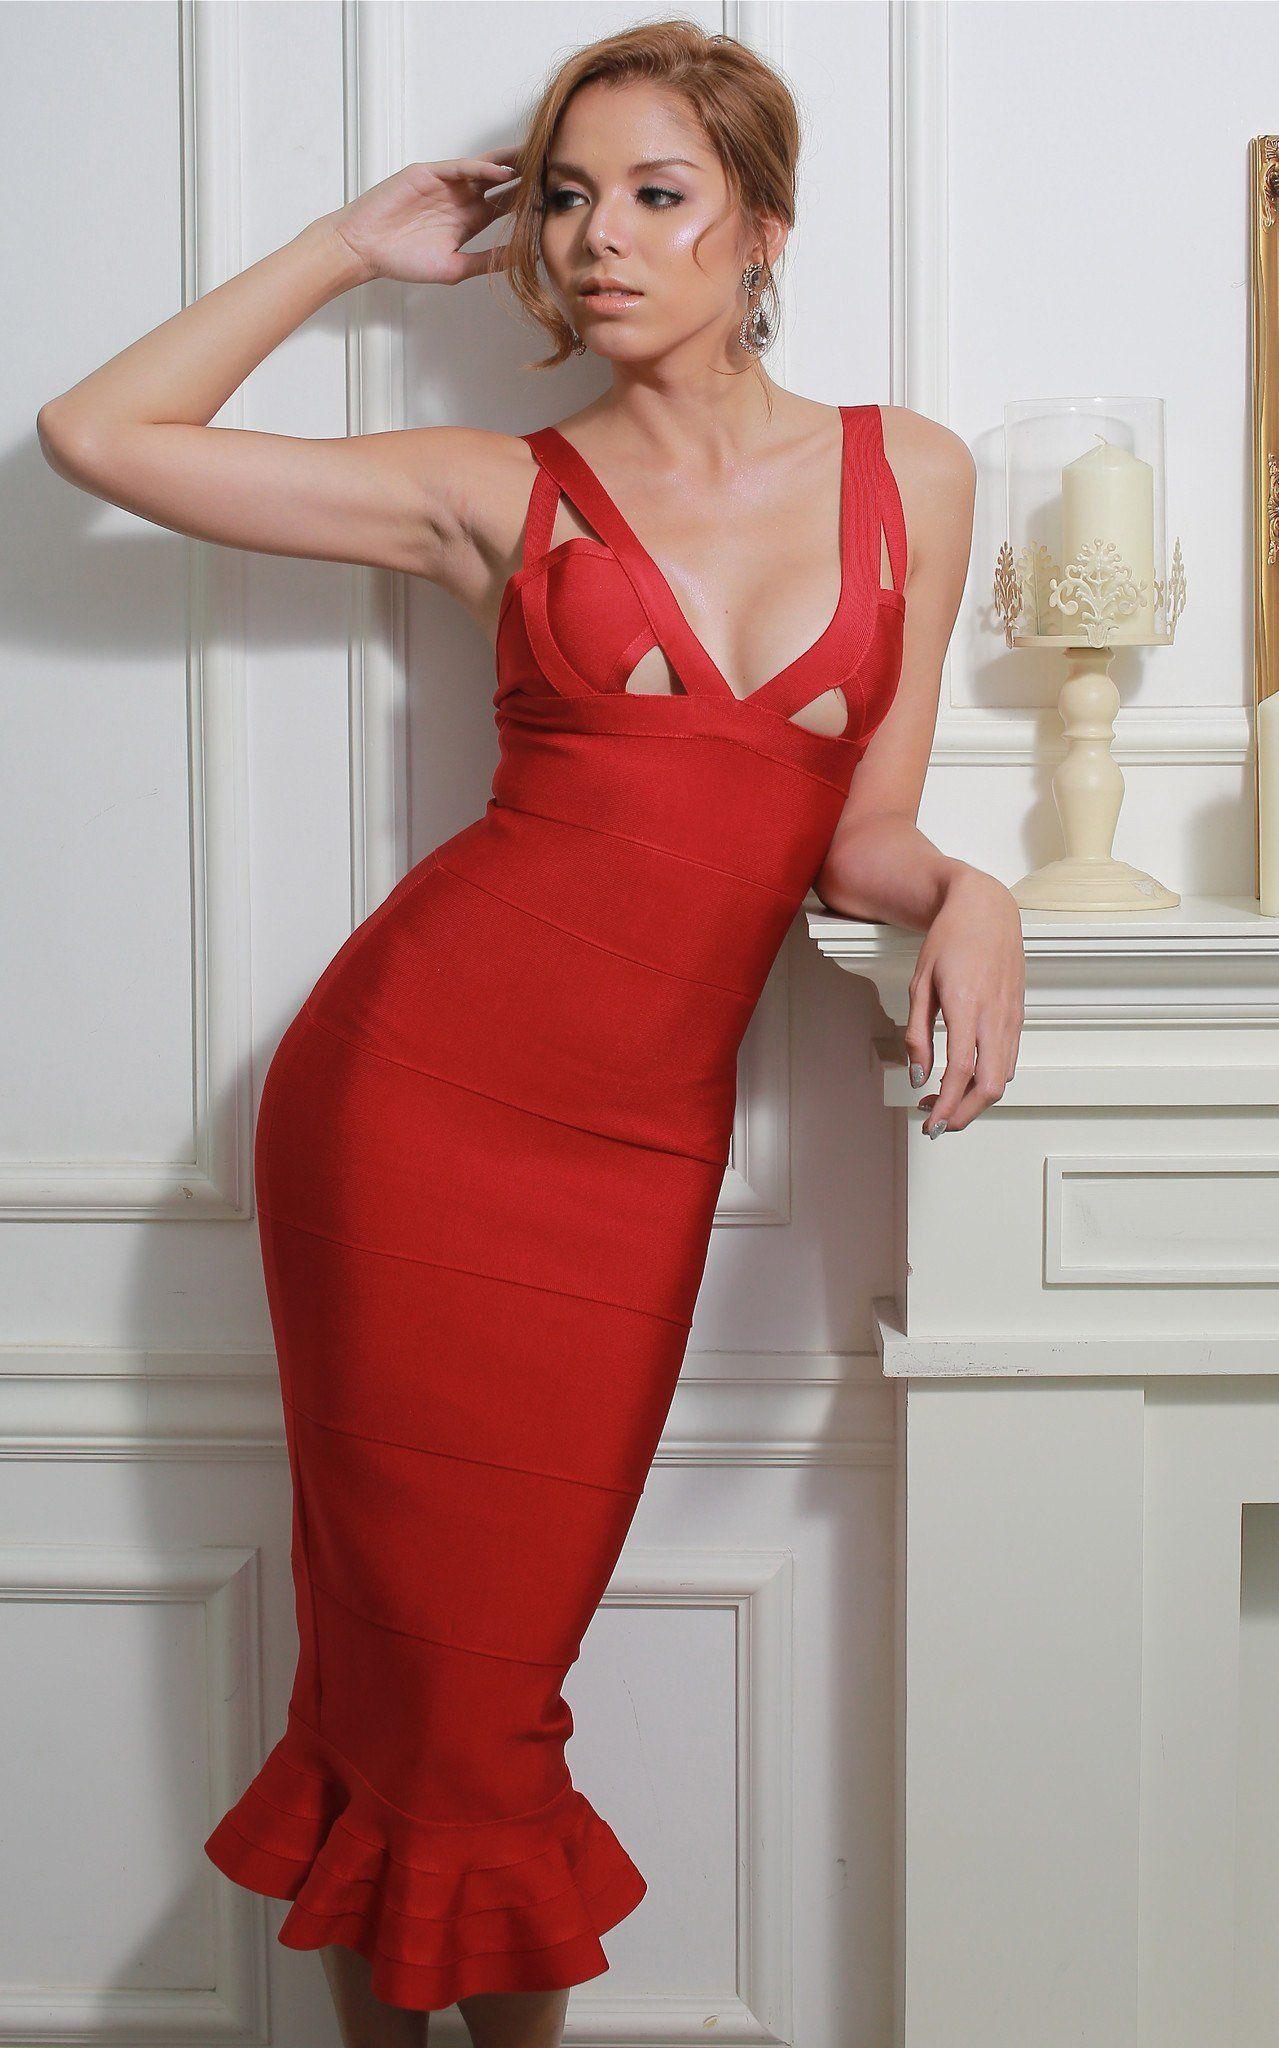 Bolero Scalloped Two Piece Bandage Dress | The Kewl Shop